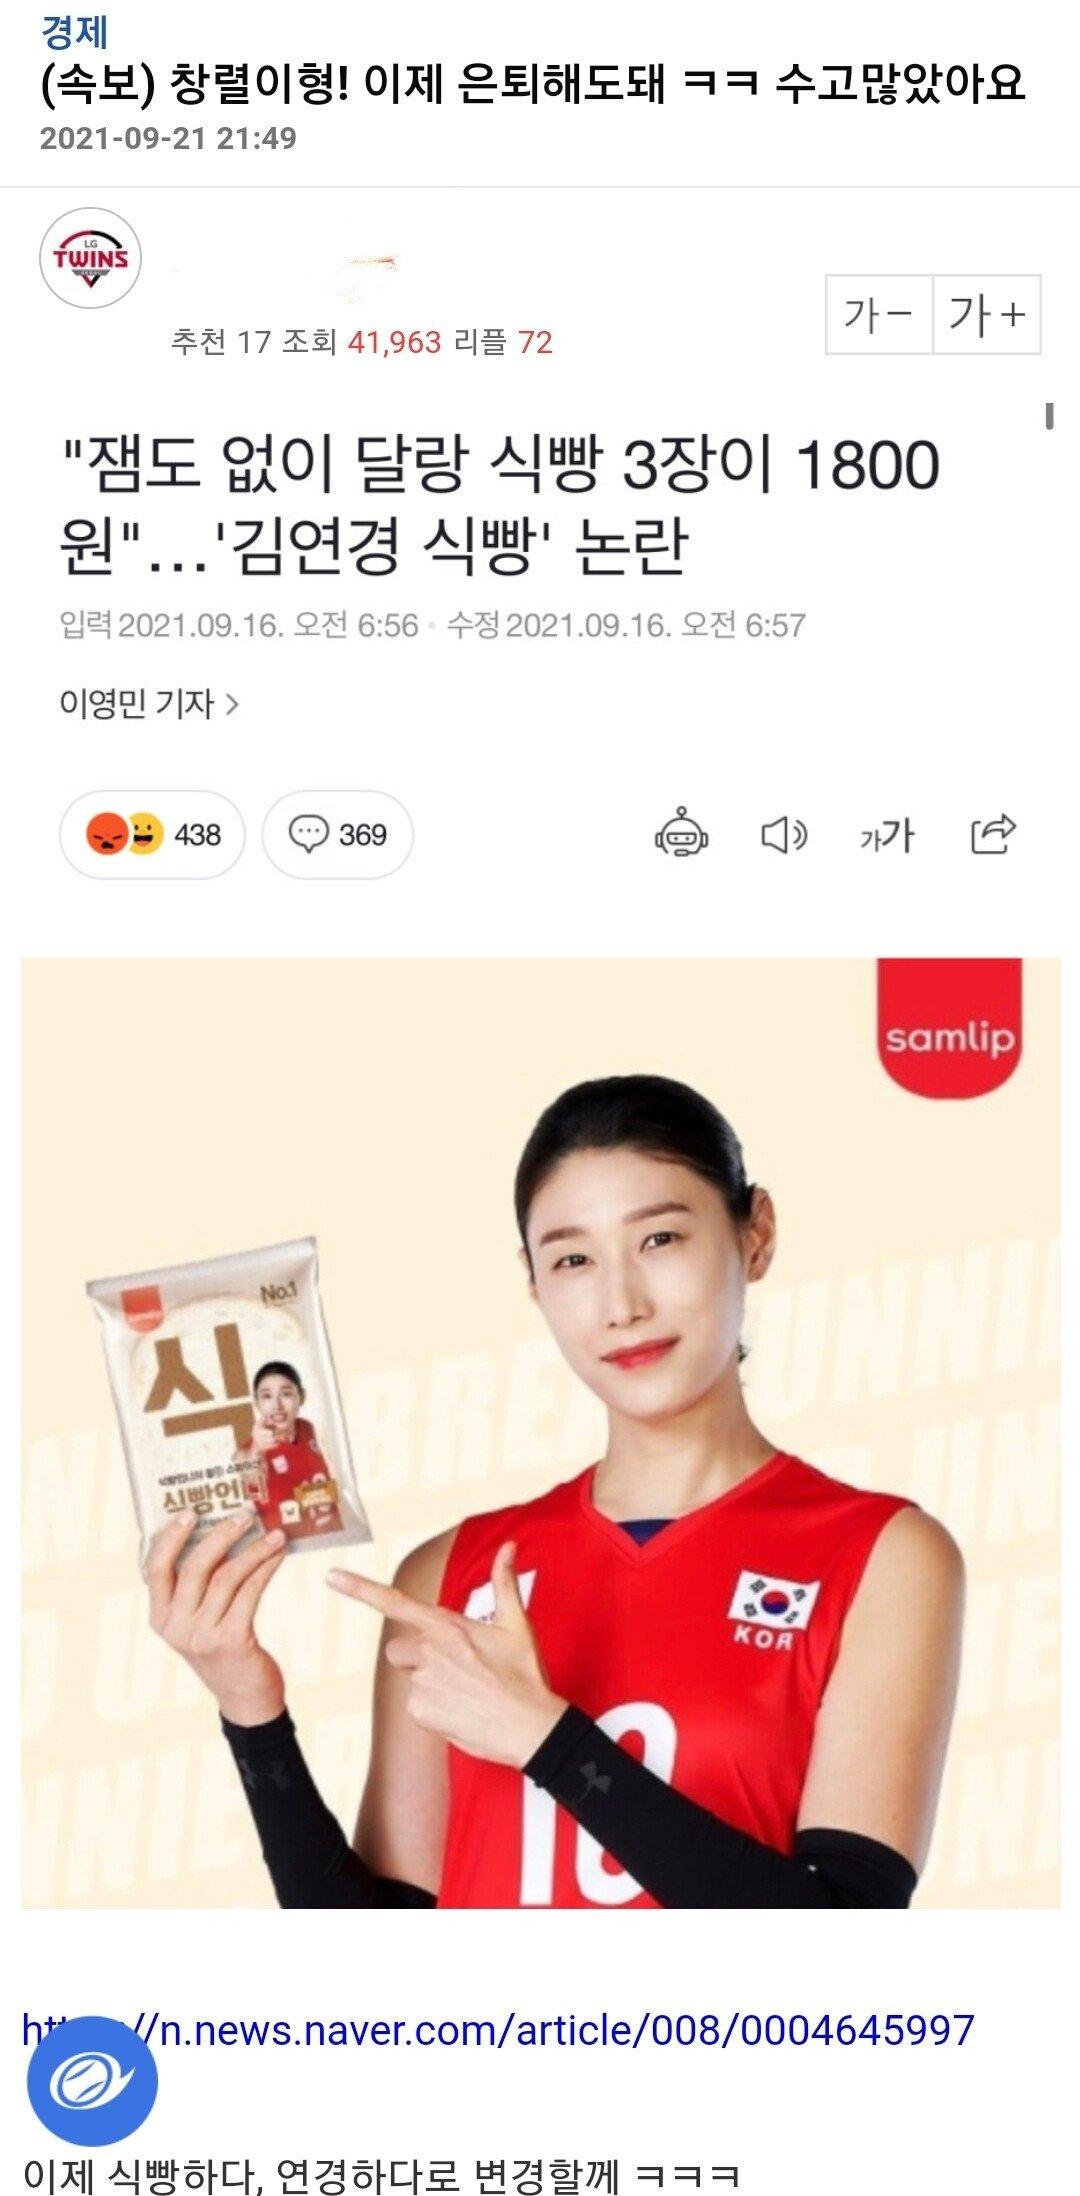 Screenshot_20210922-043615_Samsung Internet.jpg 김연경 식빵 창렬 논란.jpg